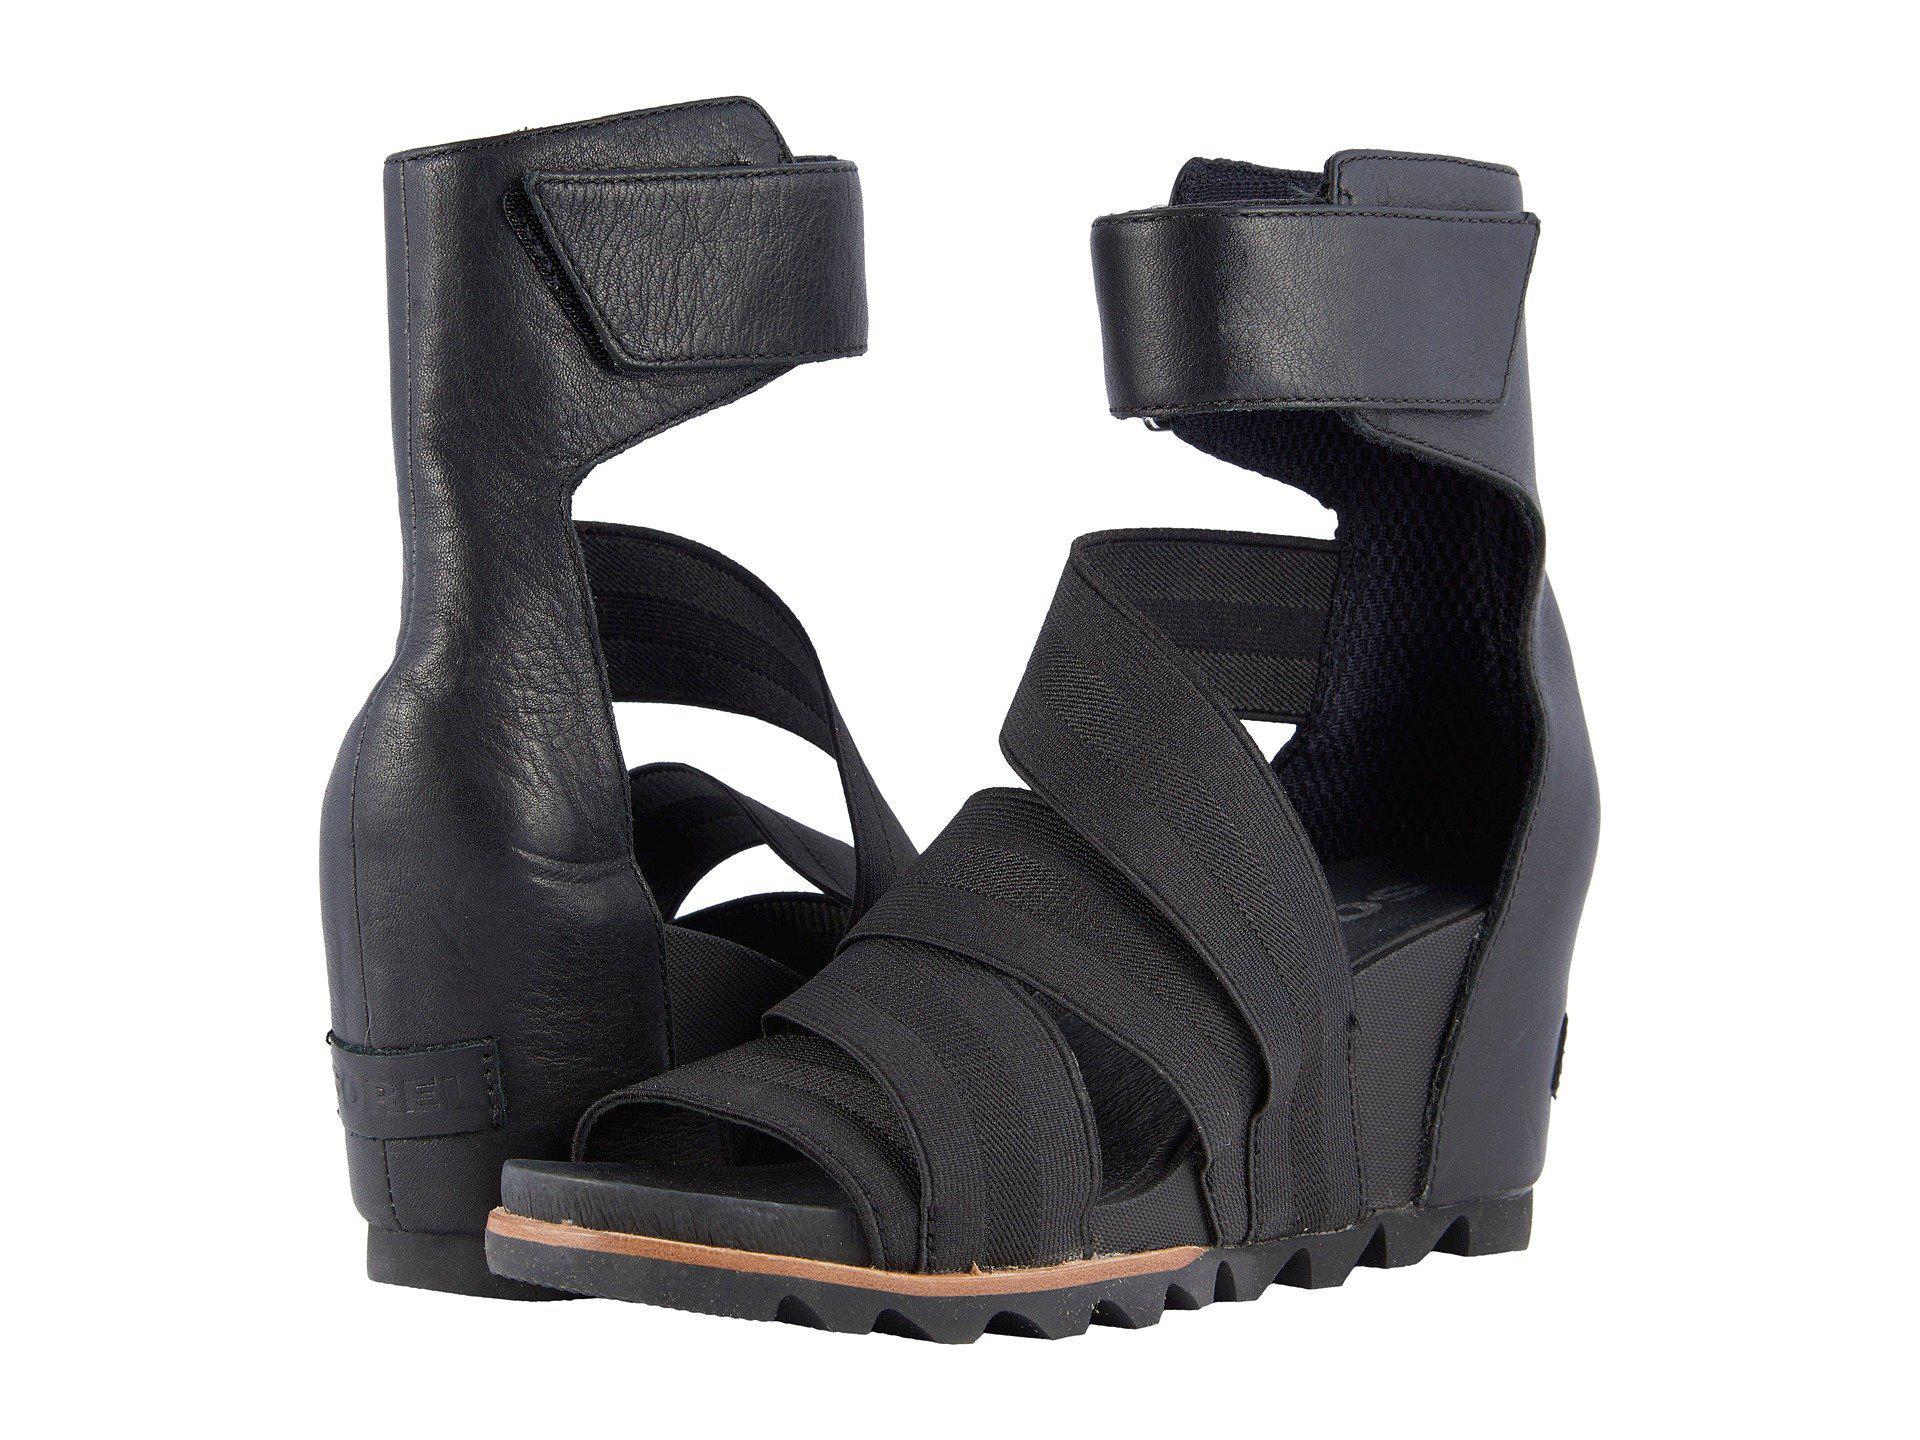 ac3f419c2cbc Lyst - Sorel Joanie Gladiator Ii (olive Drab) Women s Shoes in Black